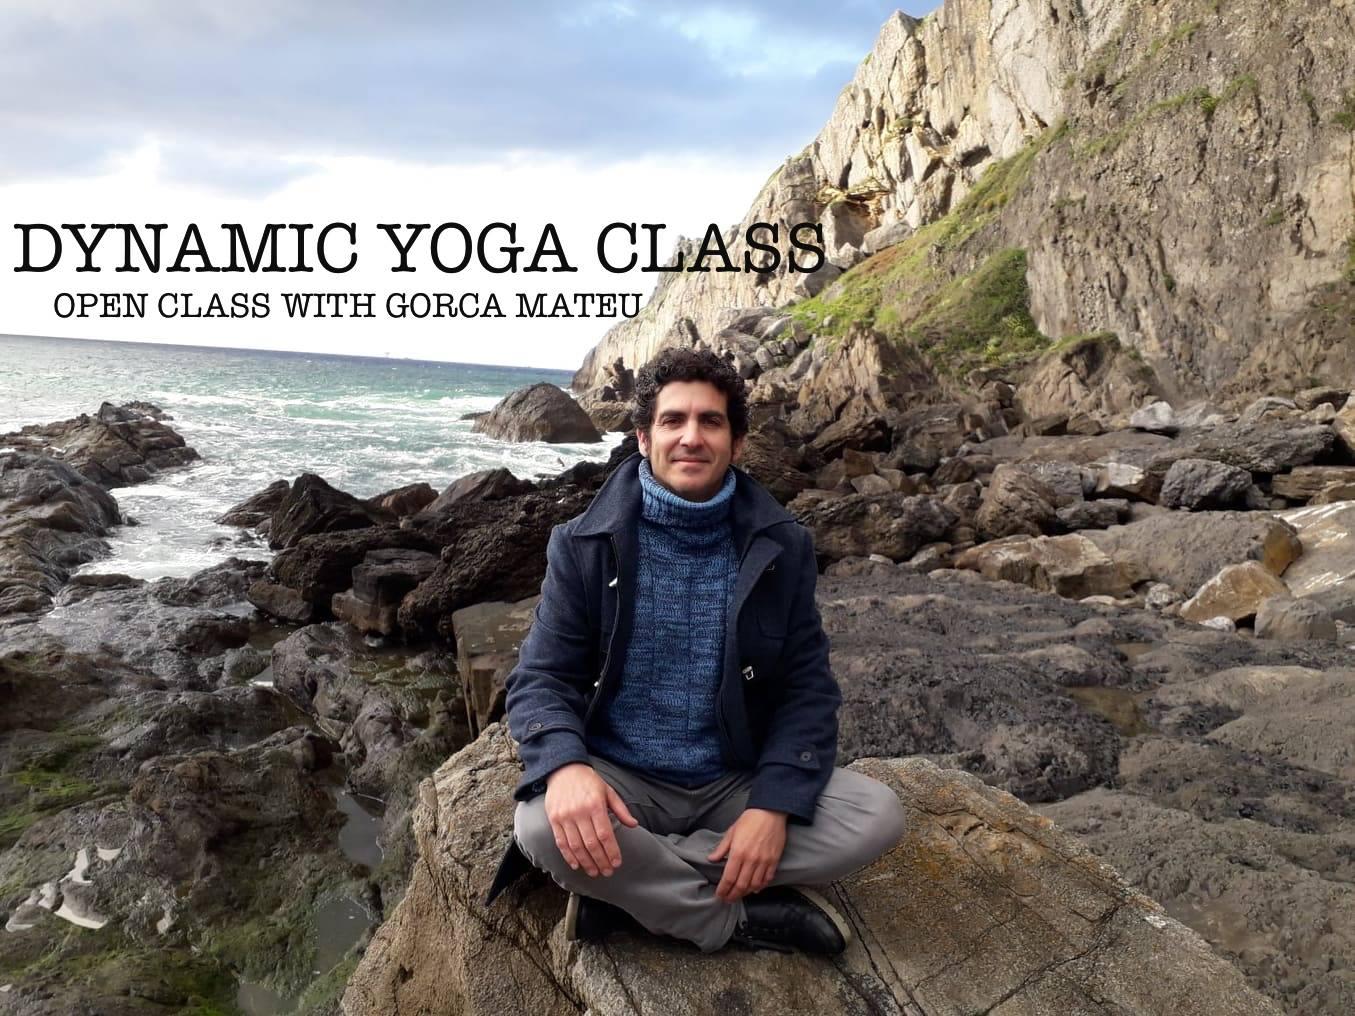 Dynamic yoga class - open class with Gorca Mateu